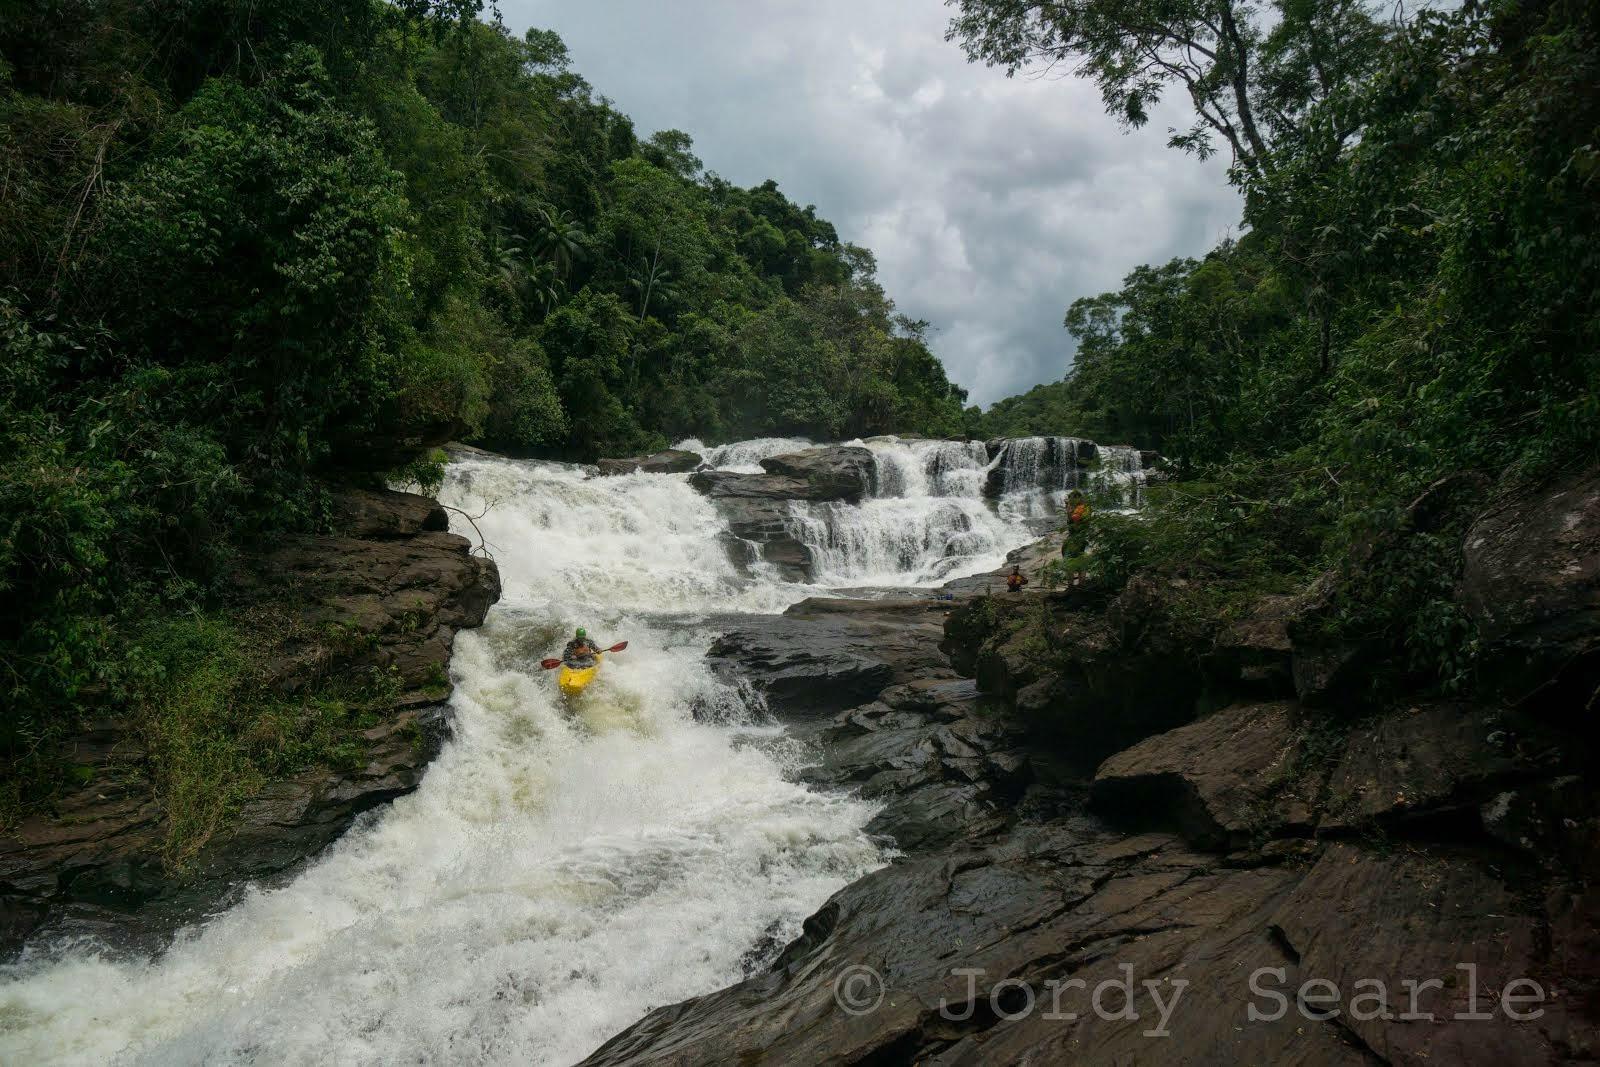 Gradient & Water - Brazil 2015